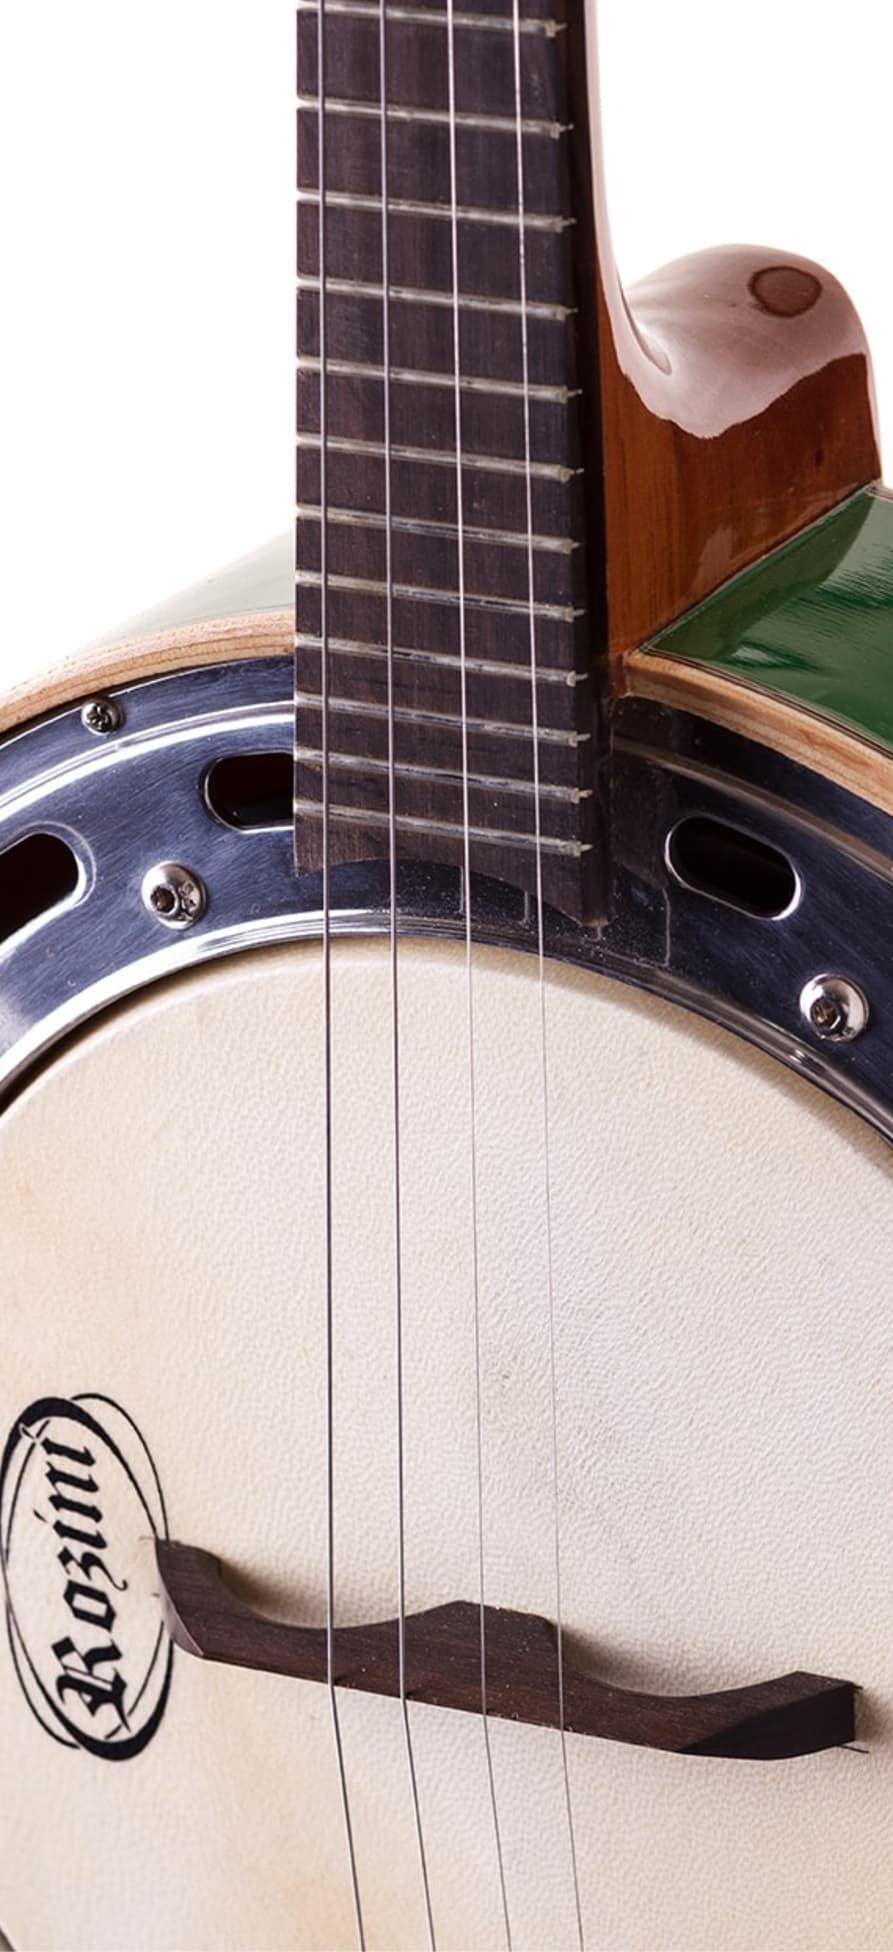 Banjo Eletro-Acústico Rozini RJ11ELV Studio Caixa Larga  Verde